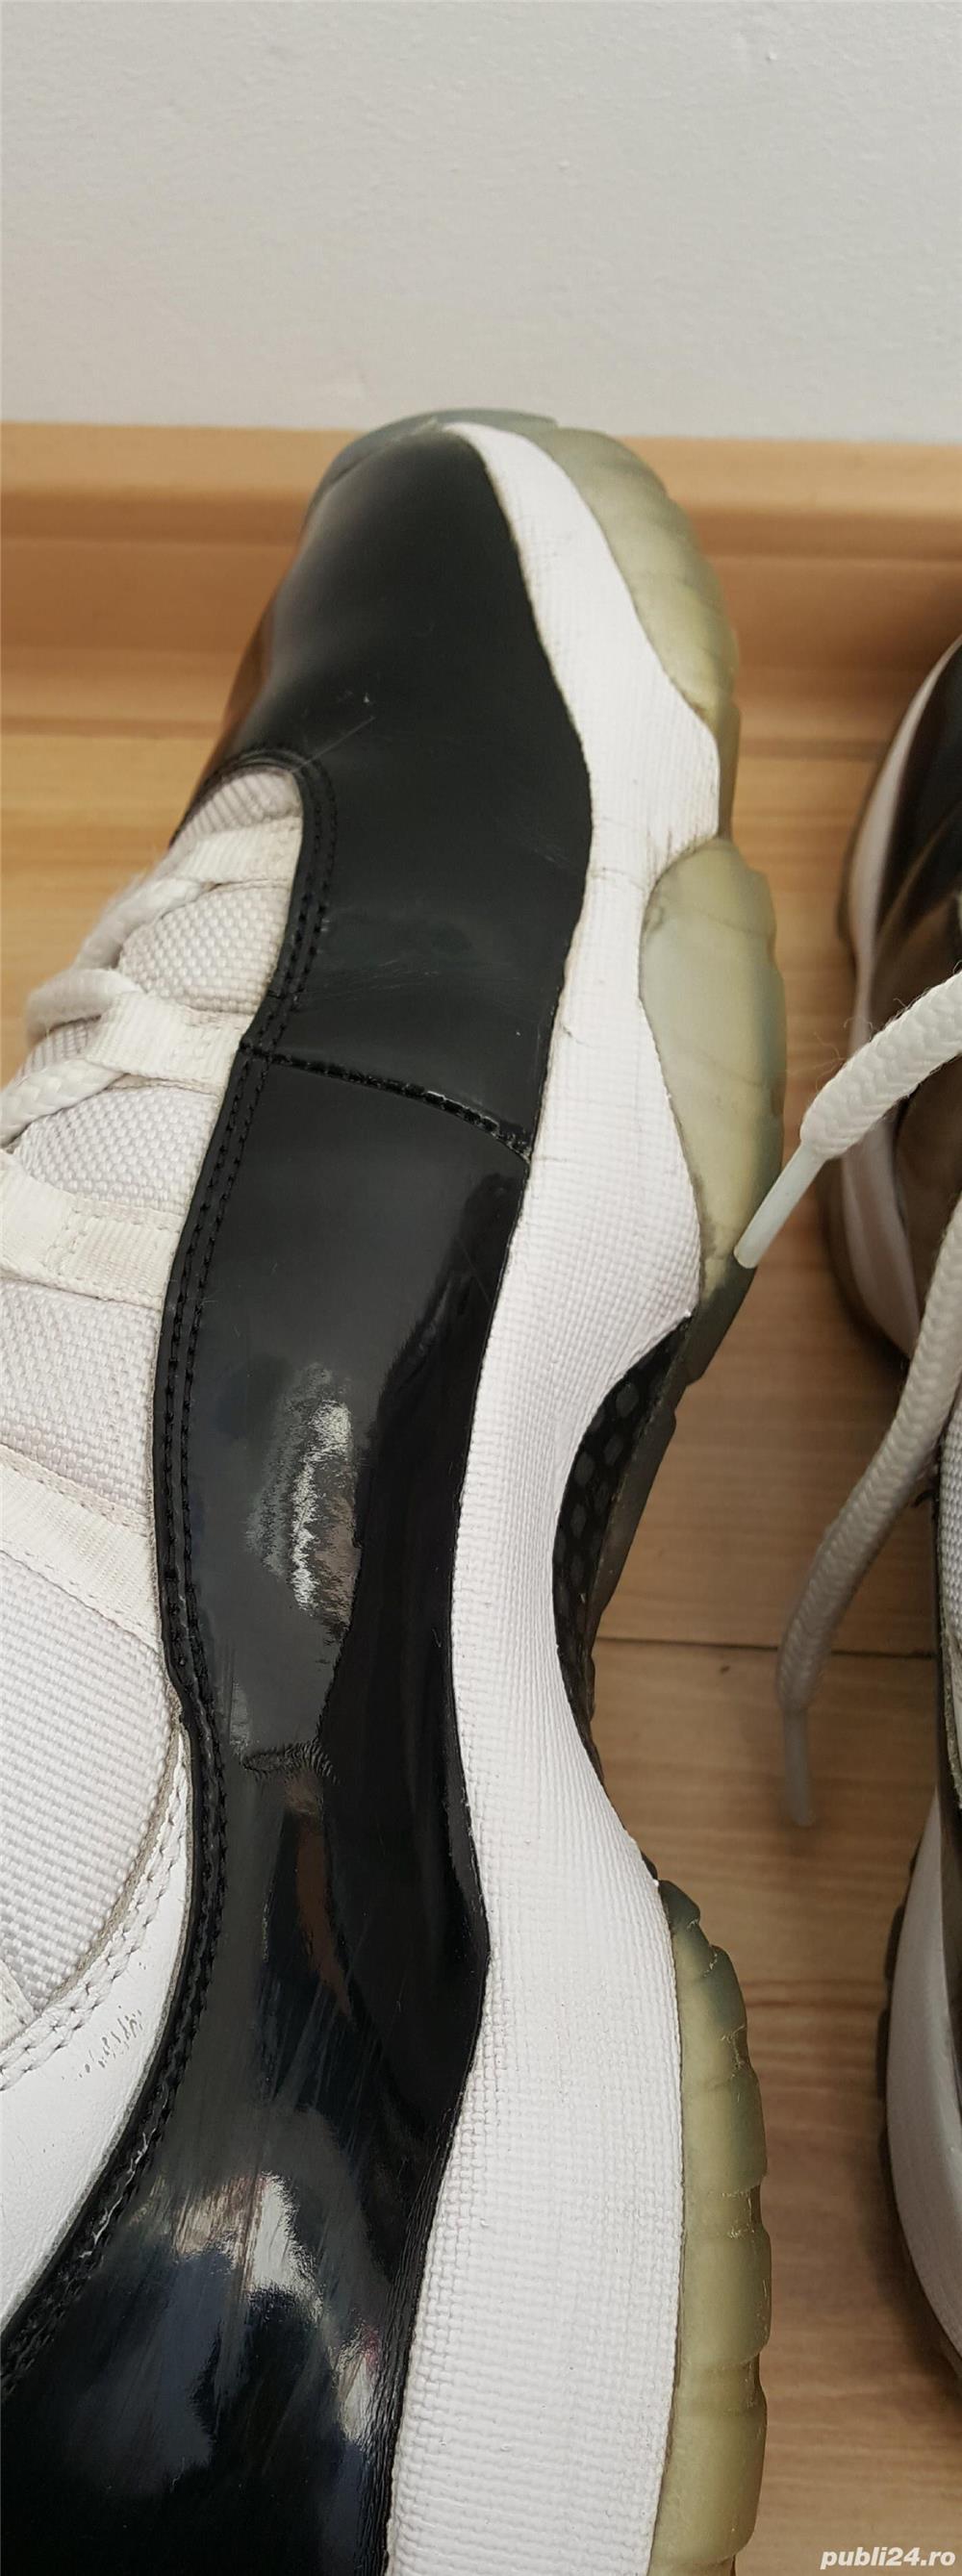 Adidas air jordan concord 11  45